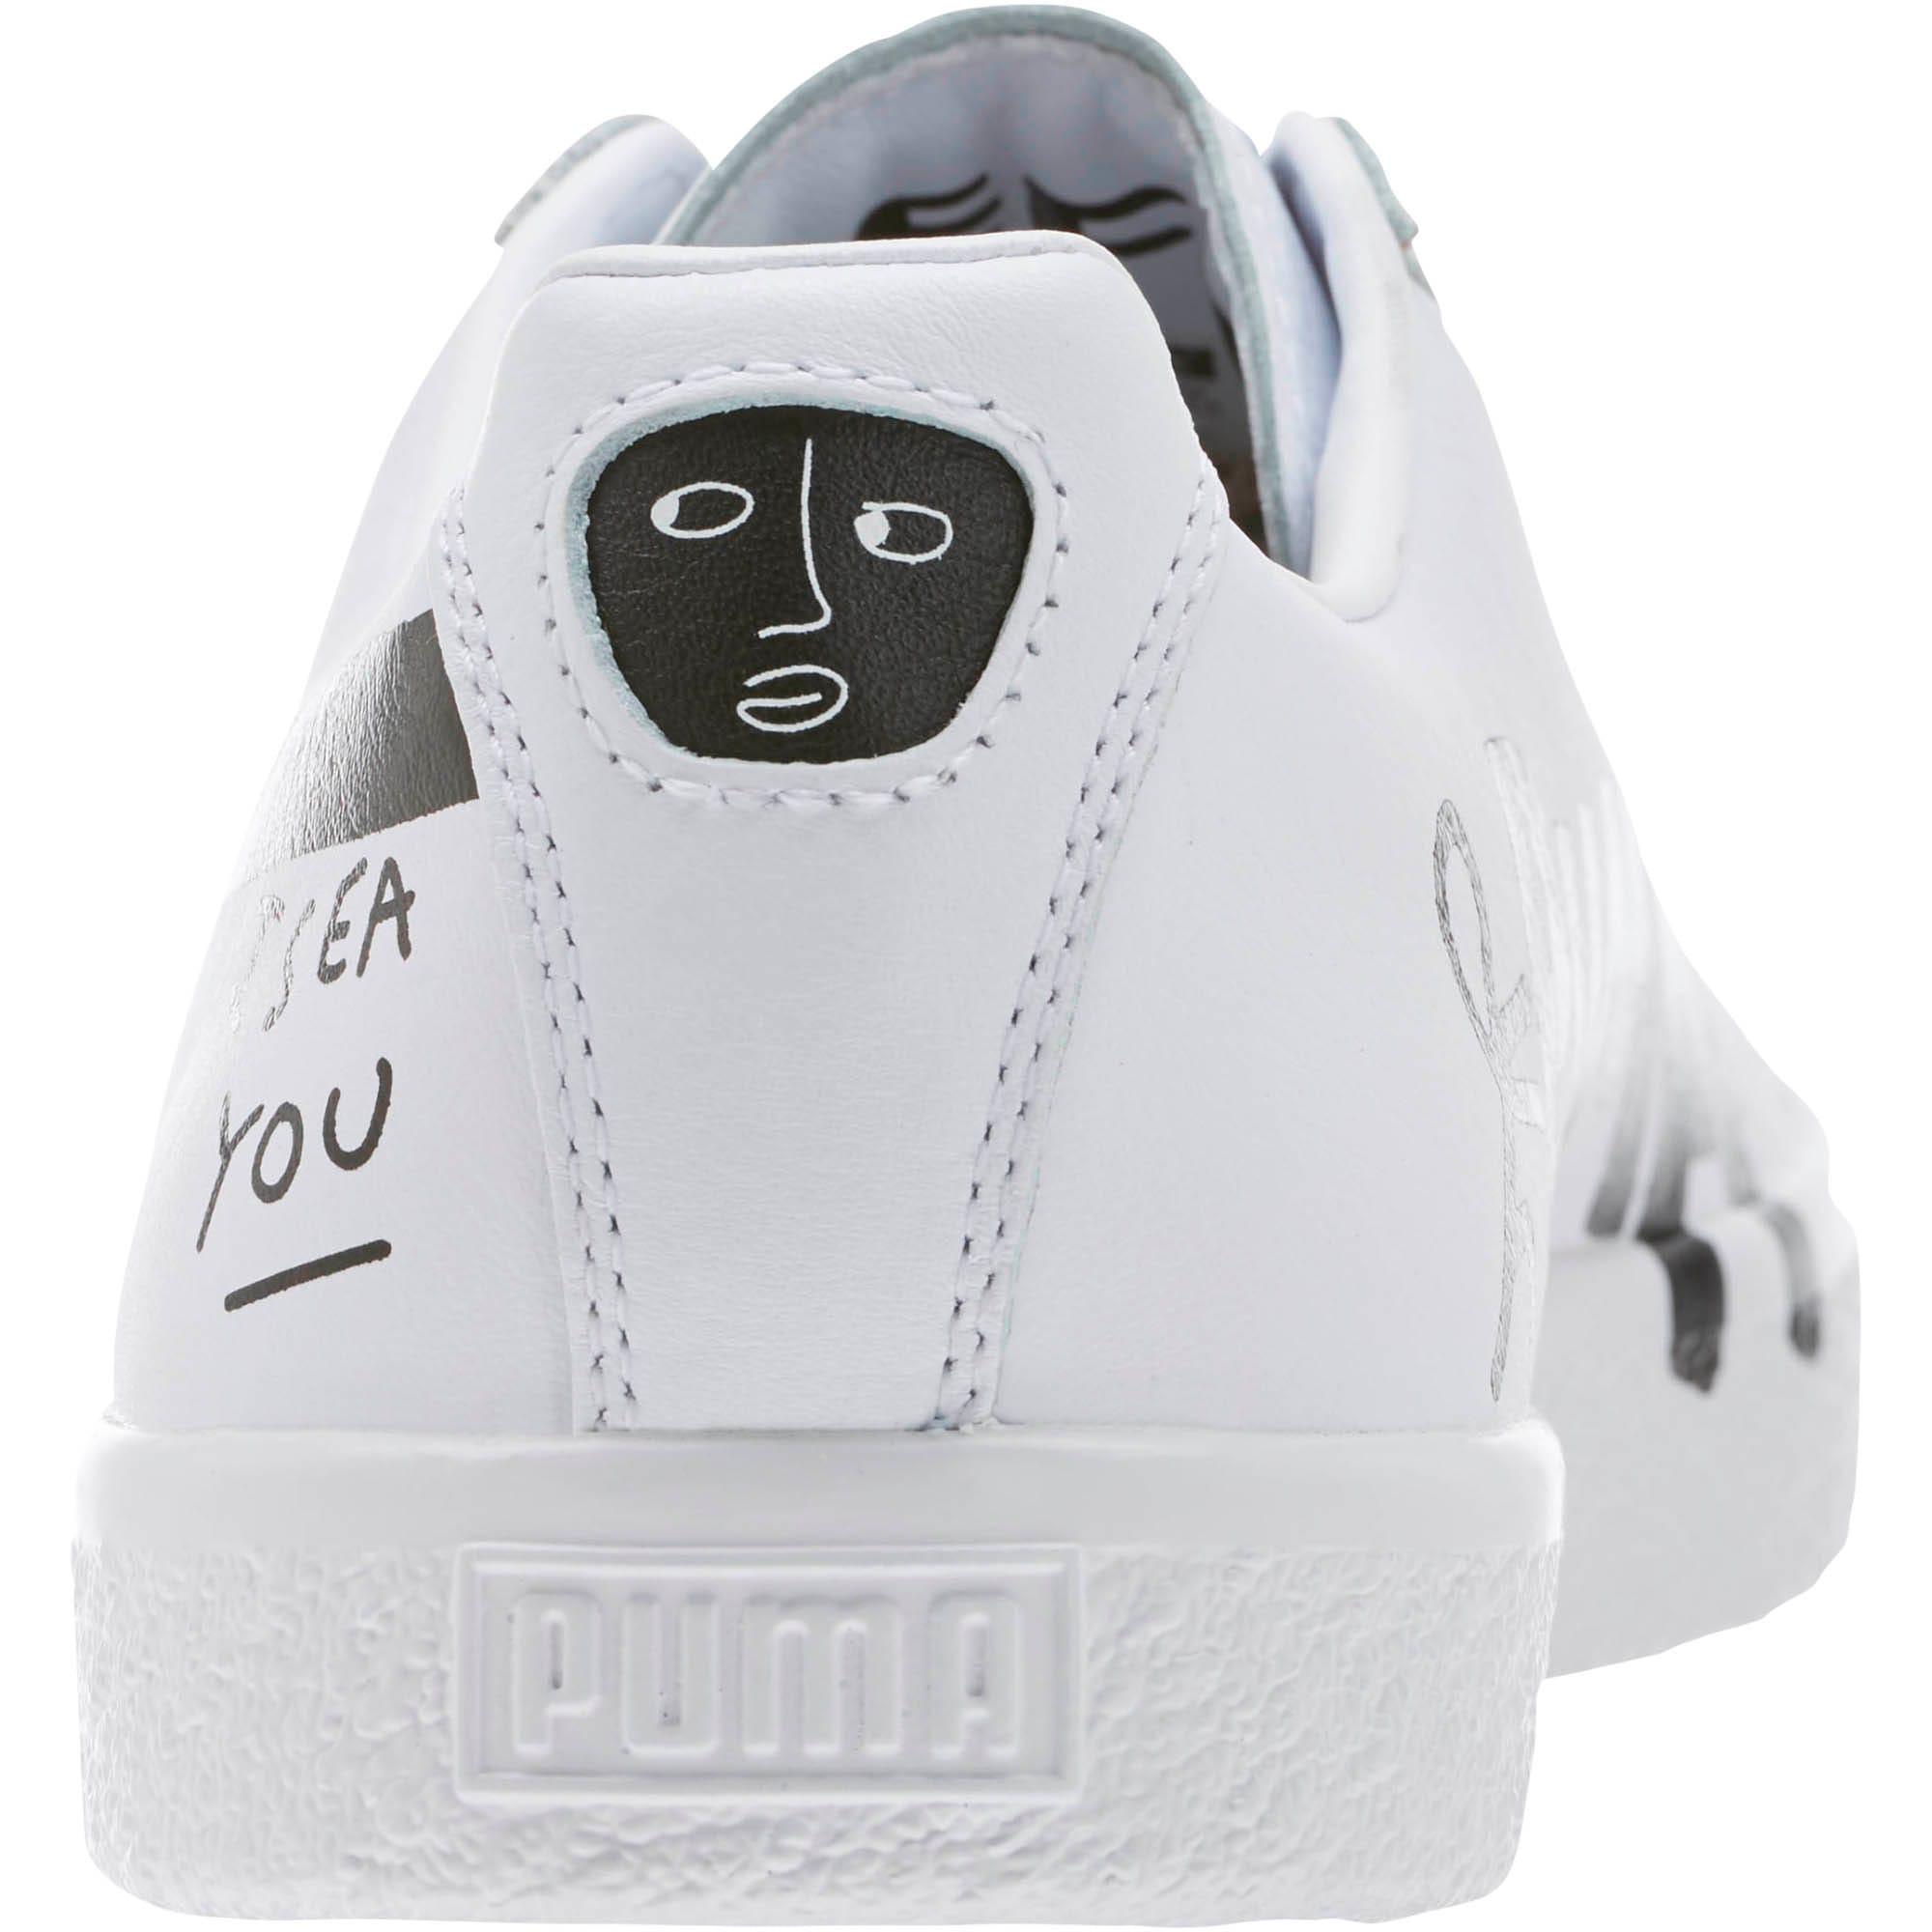 Thumbnail 4 of PUMA x SHANTELL MARTIN Clyde Sneakers, Puma White-Puma Black, medium